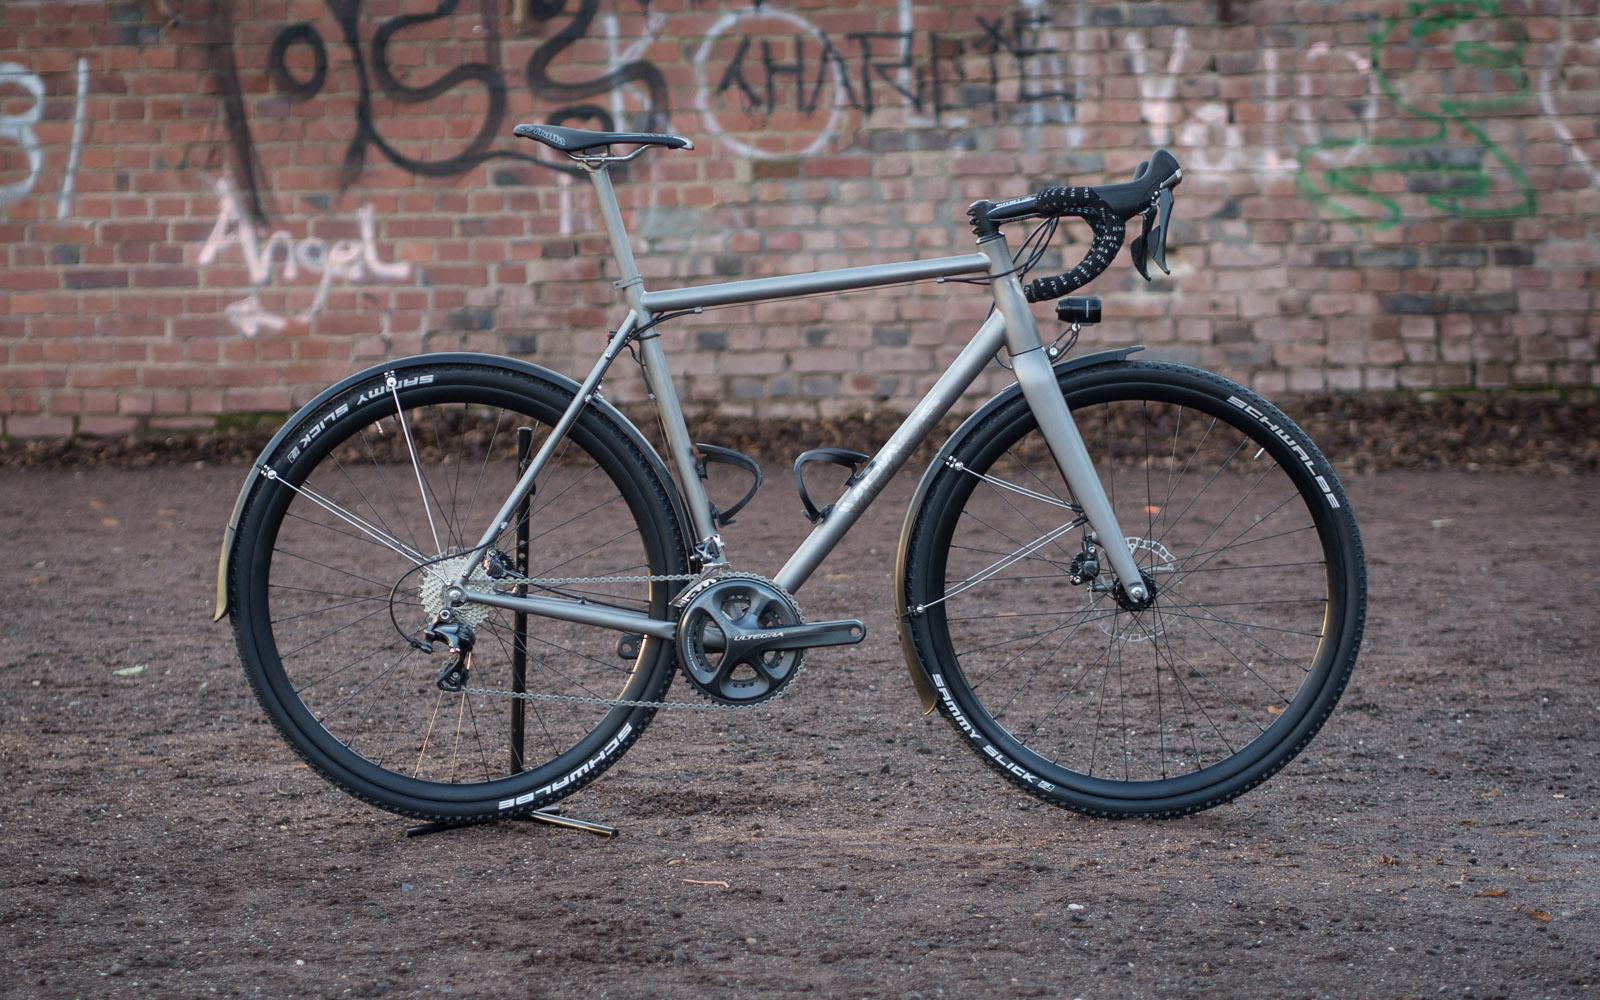 t1st titan gravel master vpace bikes. Black Bedroom Furniture Sets. Home Design Ideas